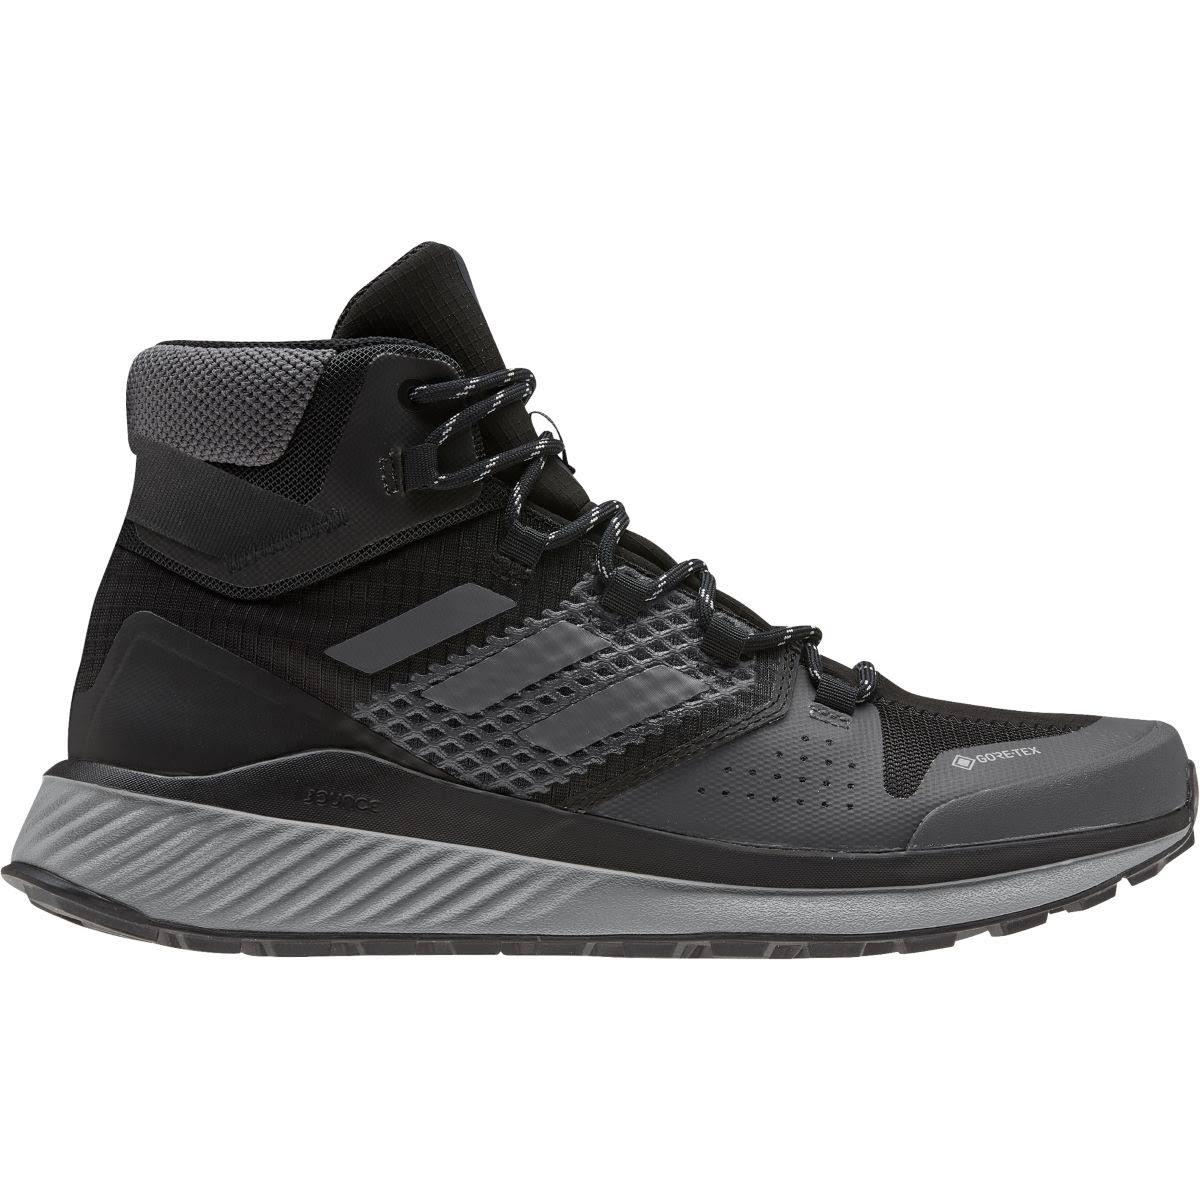 Adidas Terrex Folgian Mid Gore-Tex Hiking Shoes Hiking - Black